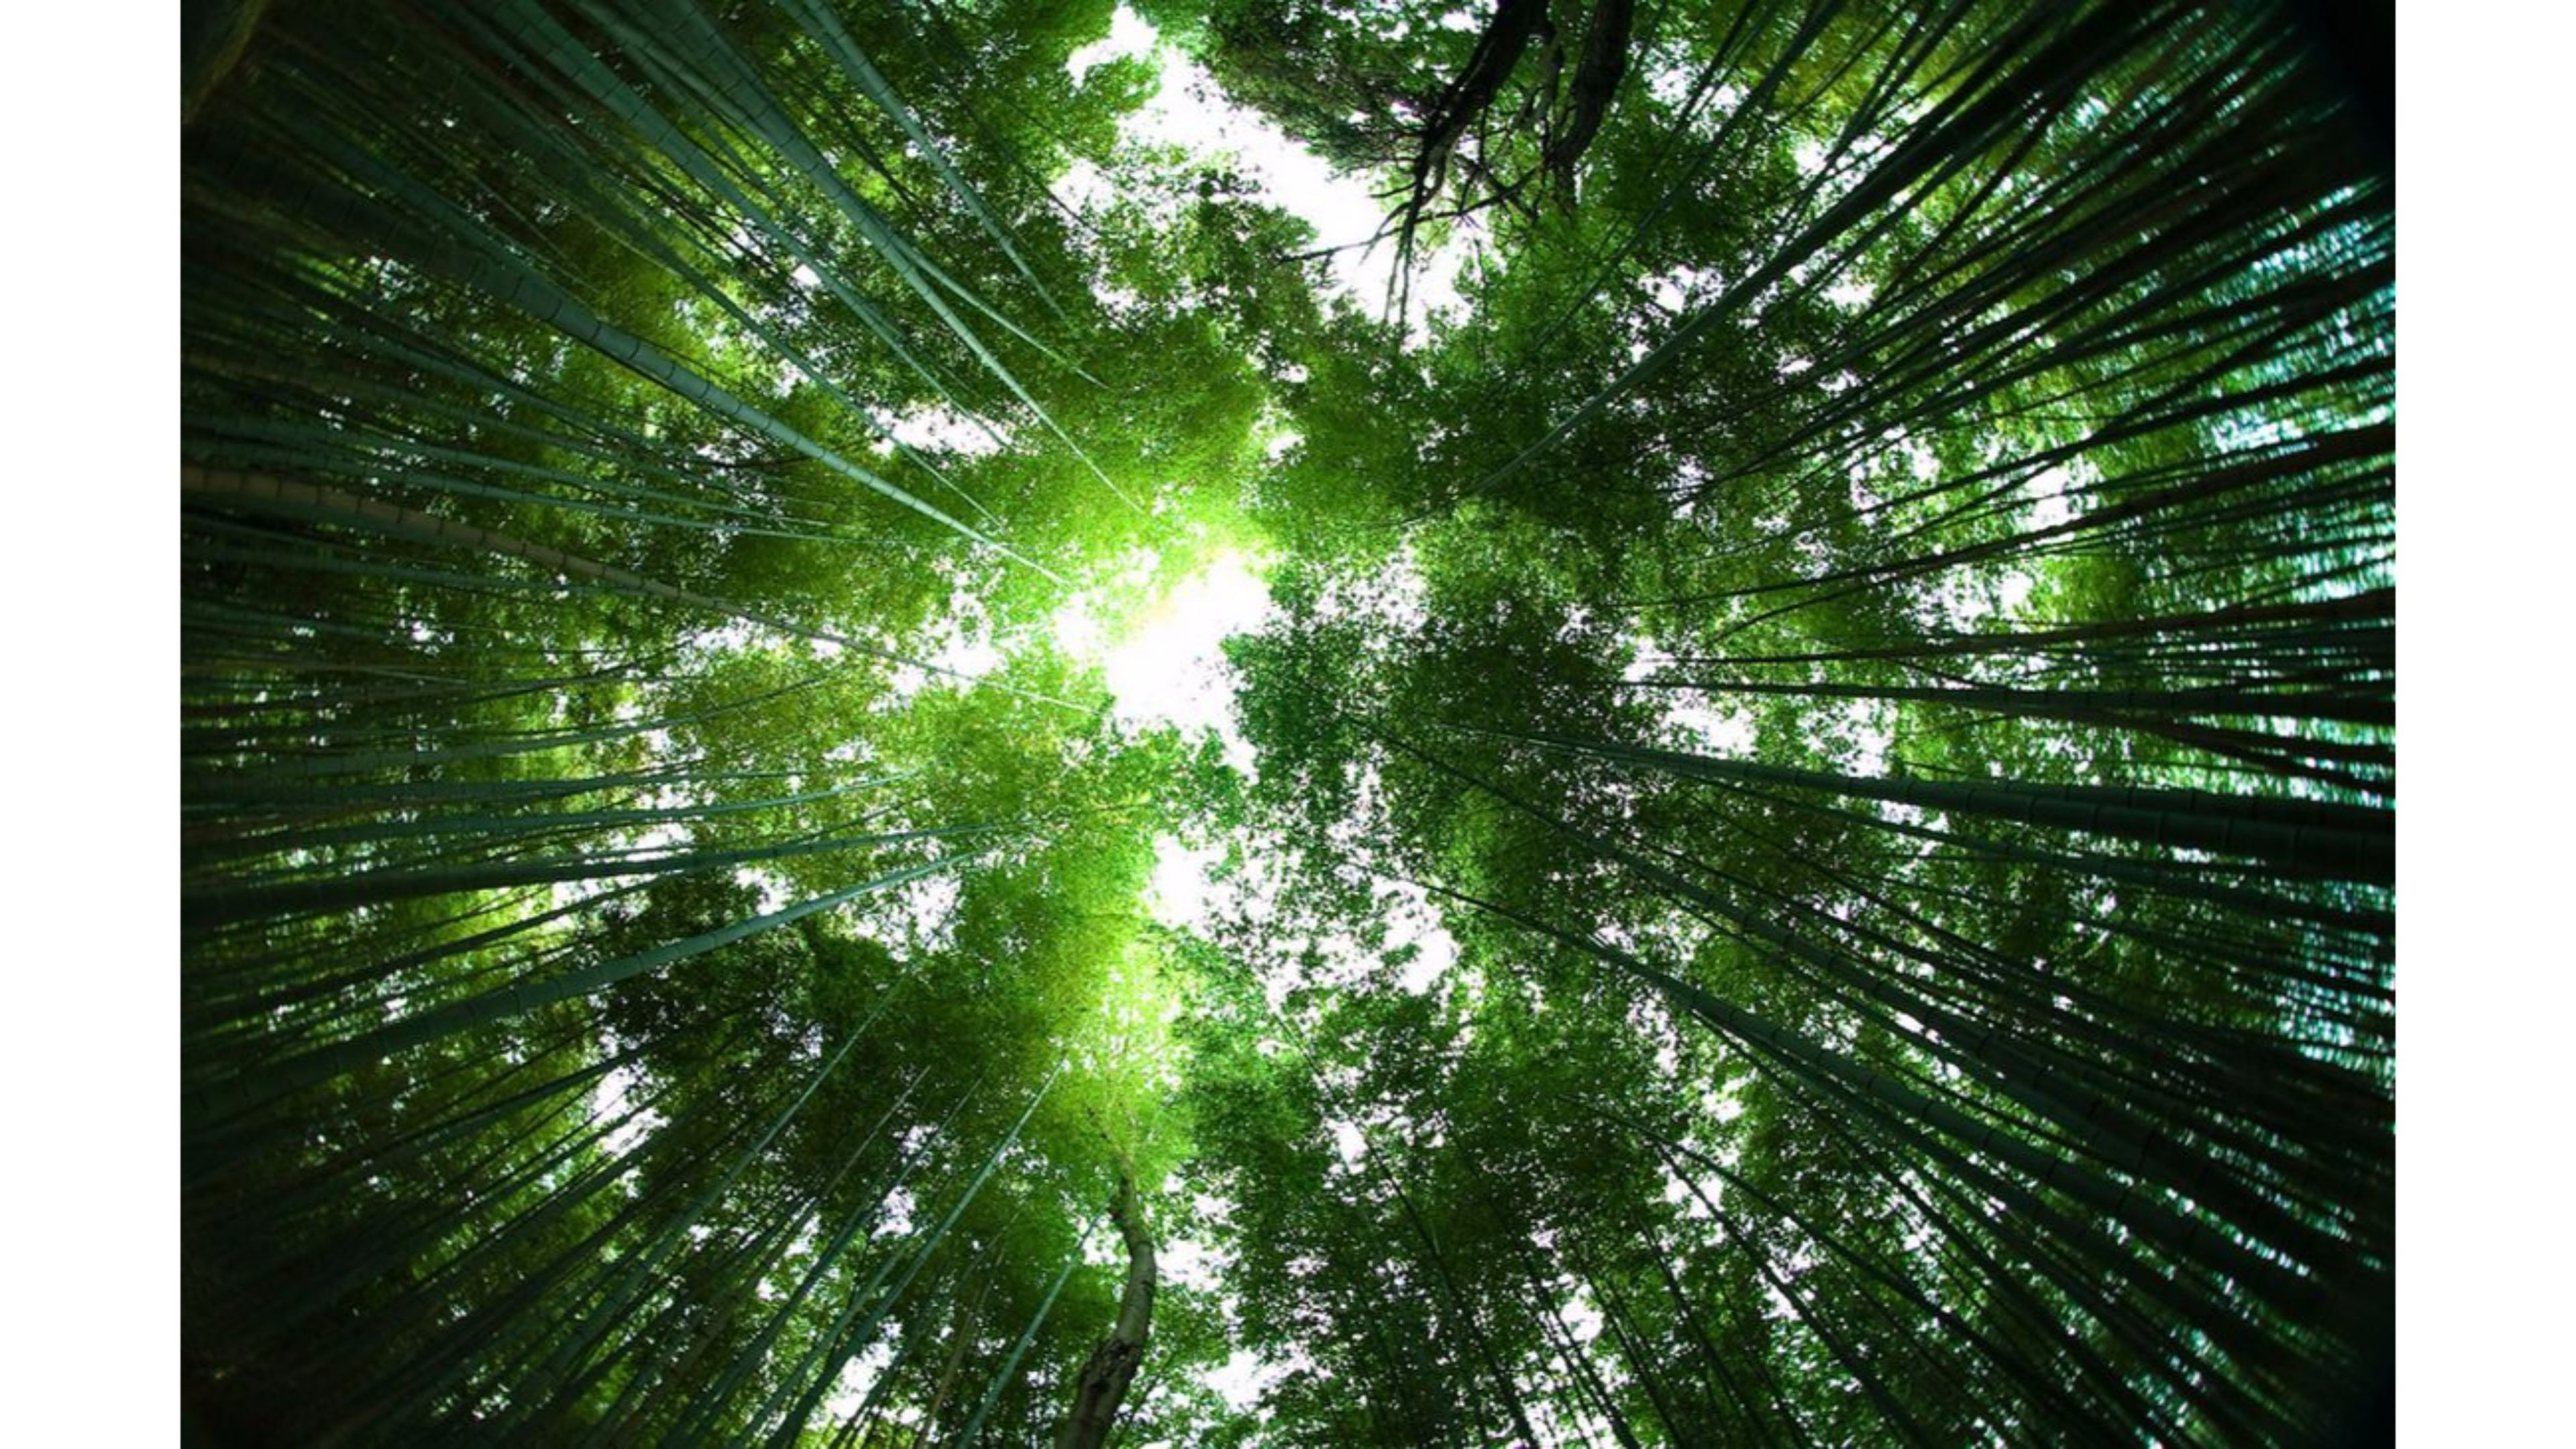 Sagano Bamboo Forest Japan 4K Wallpapers